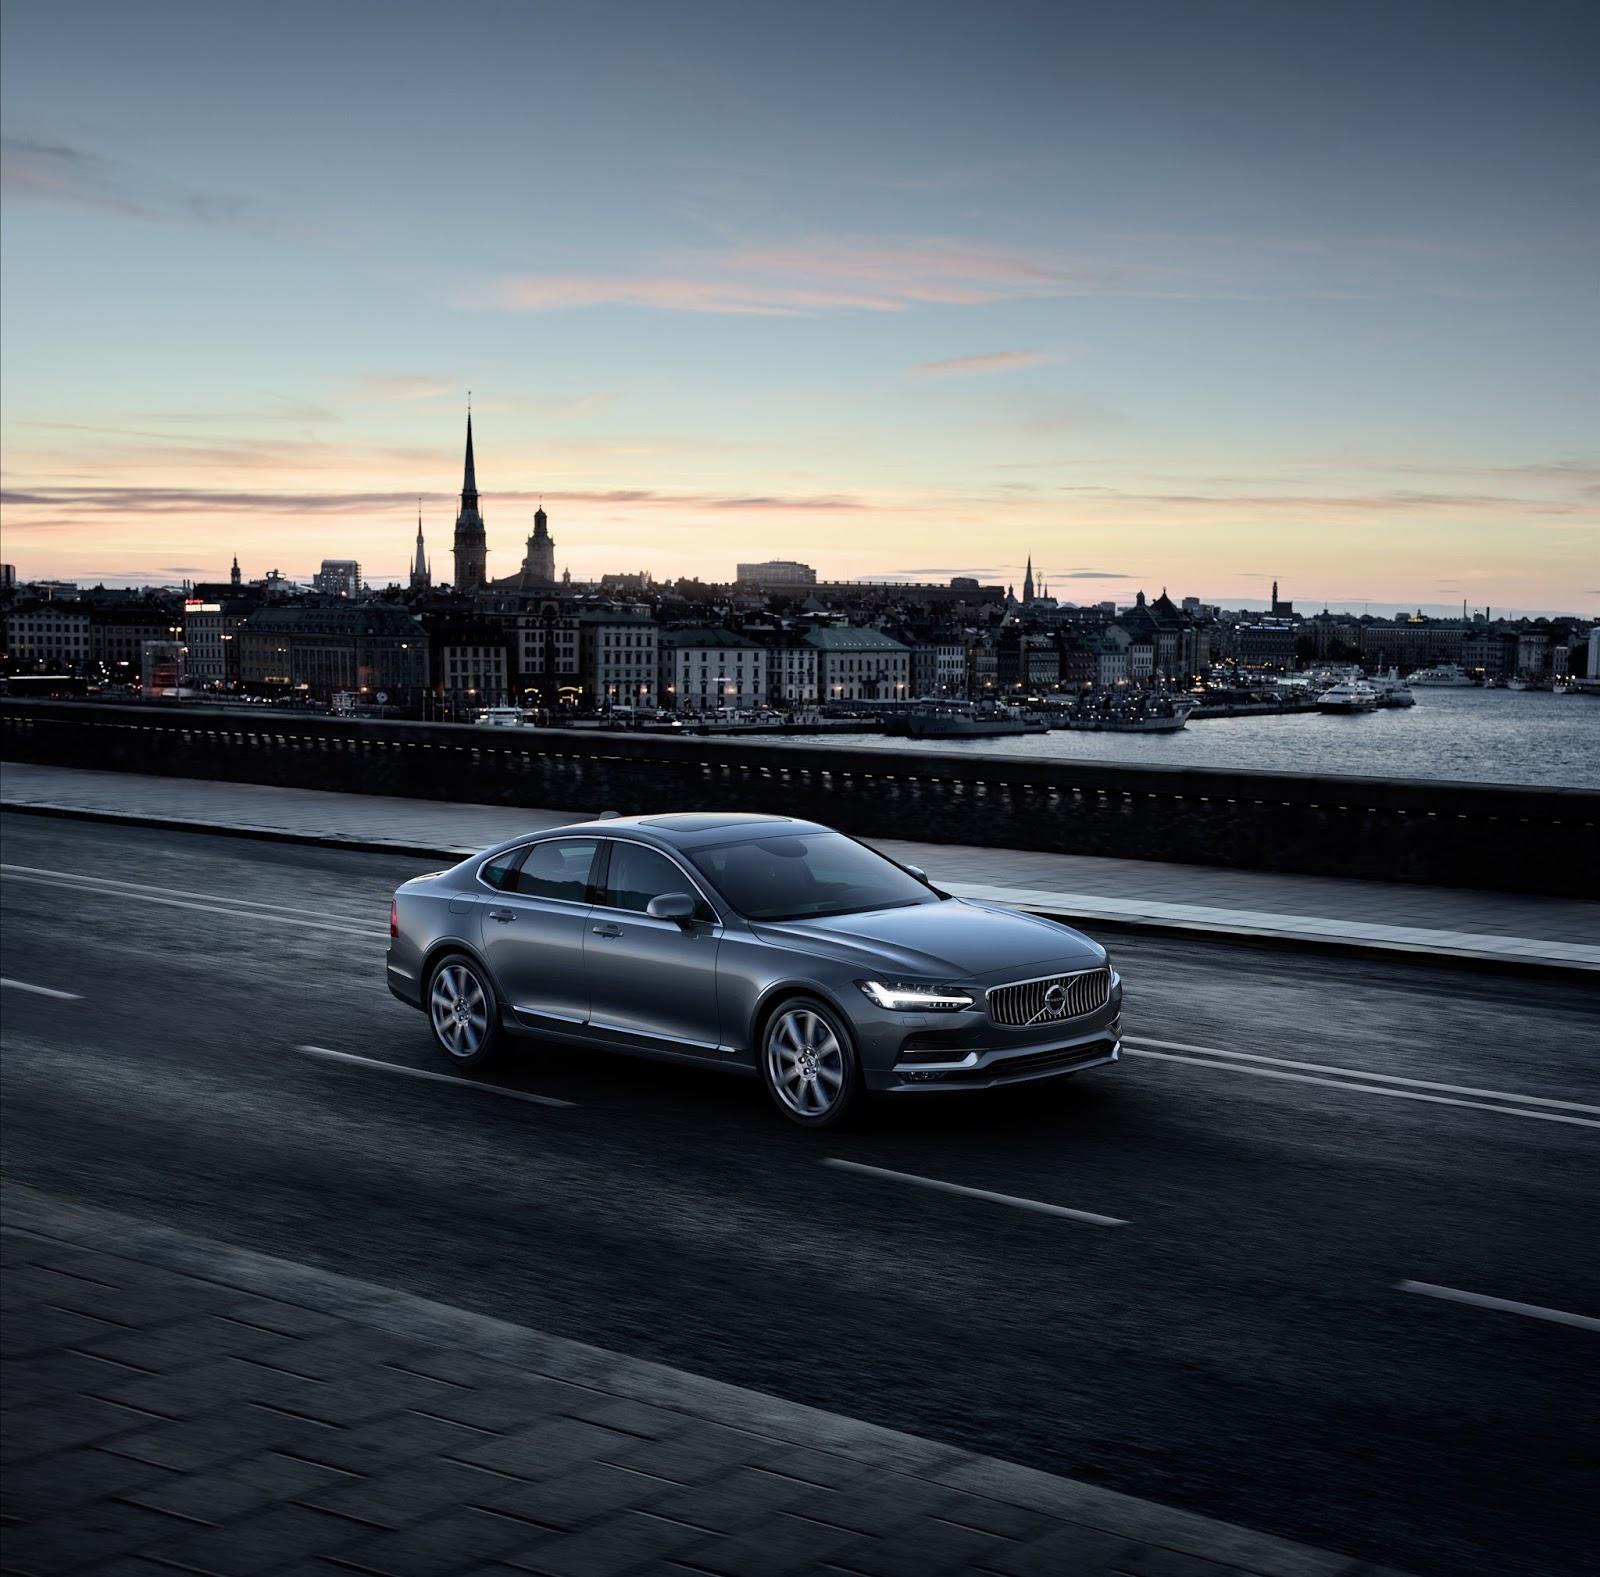 170196 Location Front Quarter Volvo S90 Osmium Grey Το νέο Volvo S90 έρχεται και βάζει φωτιά στον ανταγωνισμό premium sedan, Volvo, Volvo Cars, Volvo S90